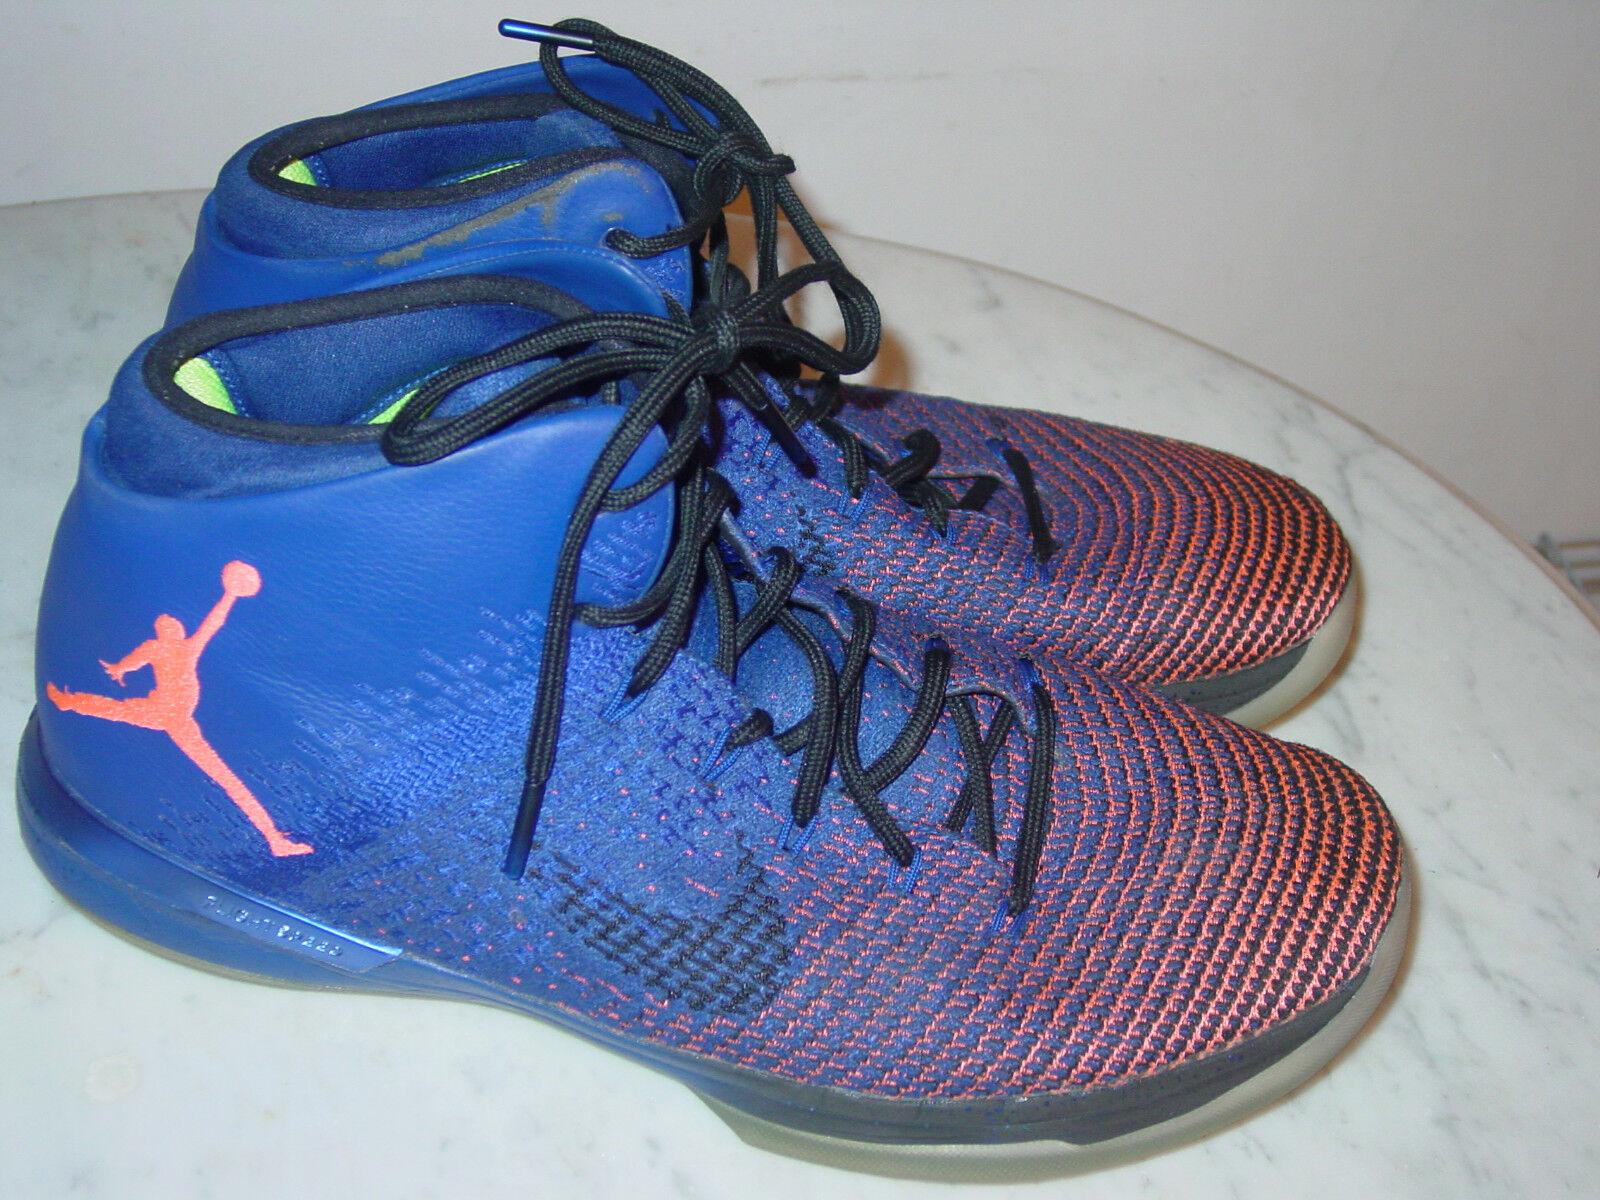 b7ff5401f5d225 2016 Nike Air Jordan 31 Supernova Supernova Supernova Concord Bright Mango  shoes Size 14 efbe2a